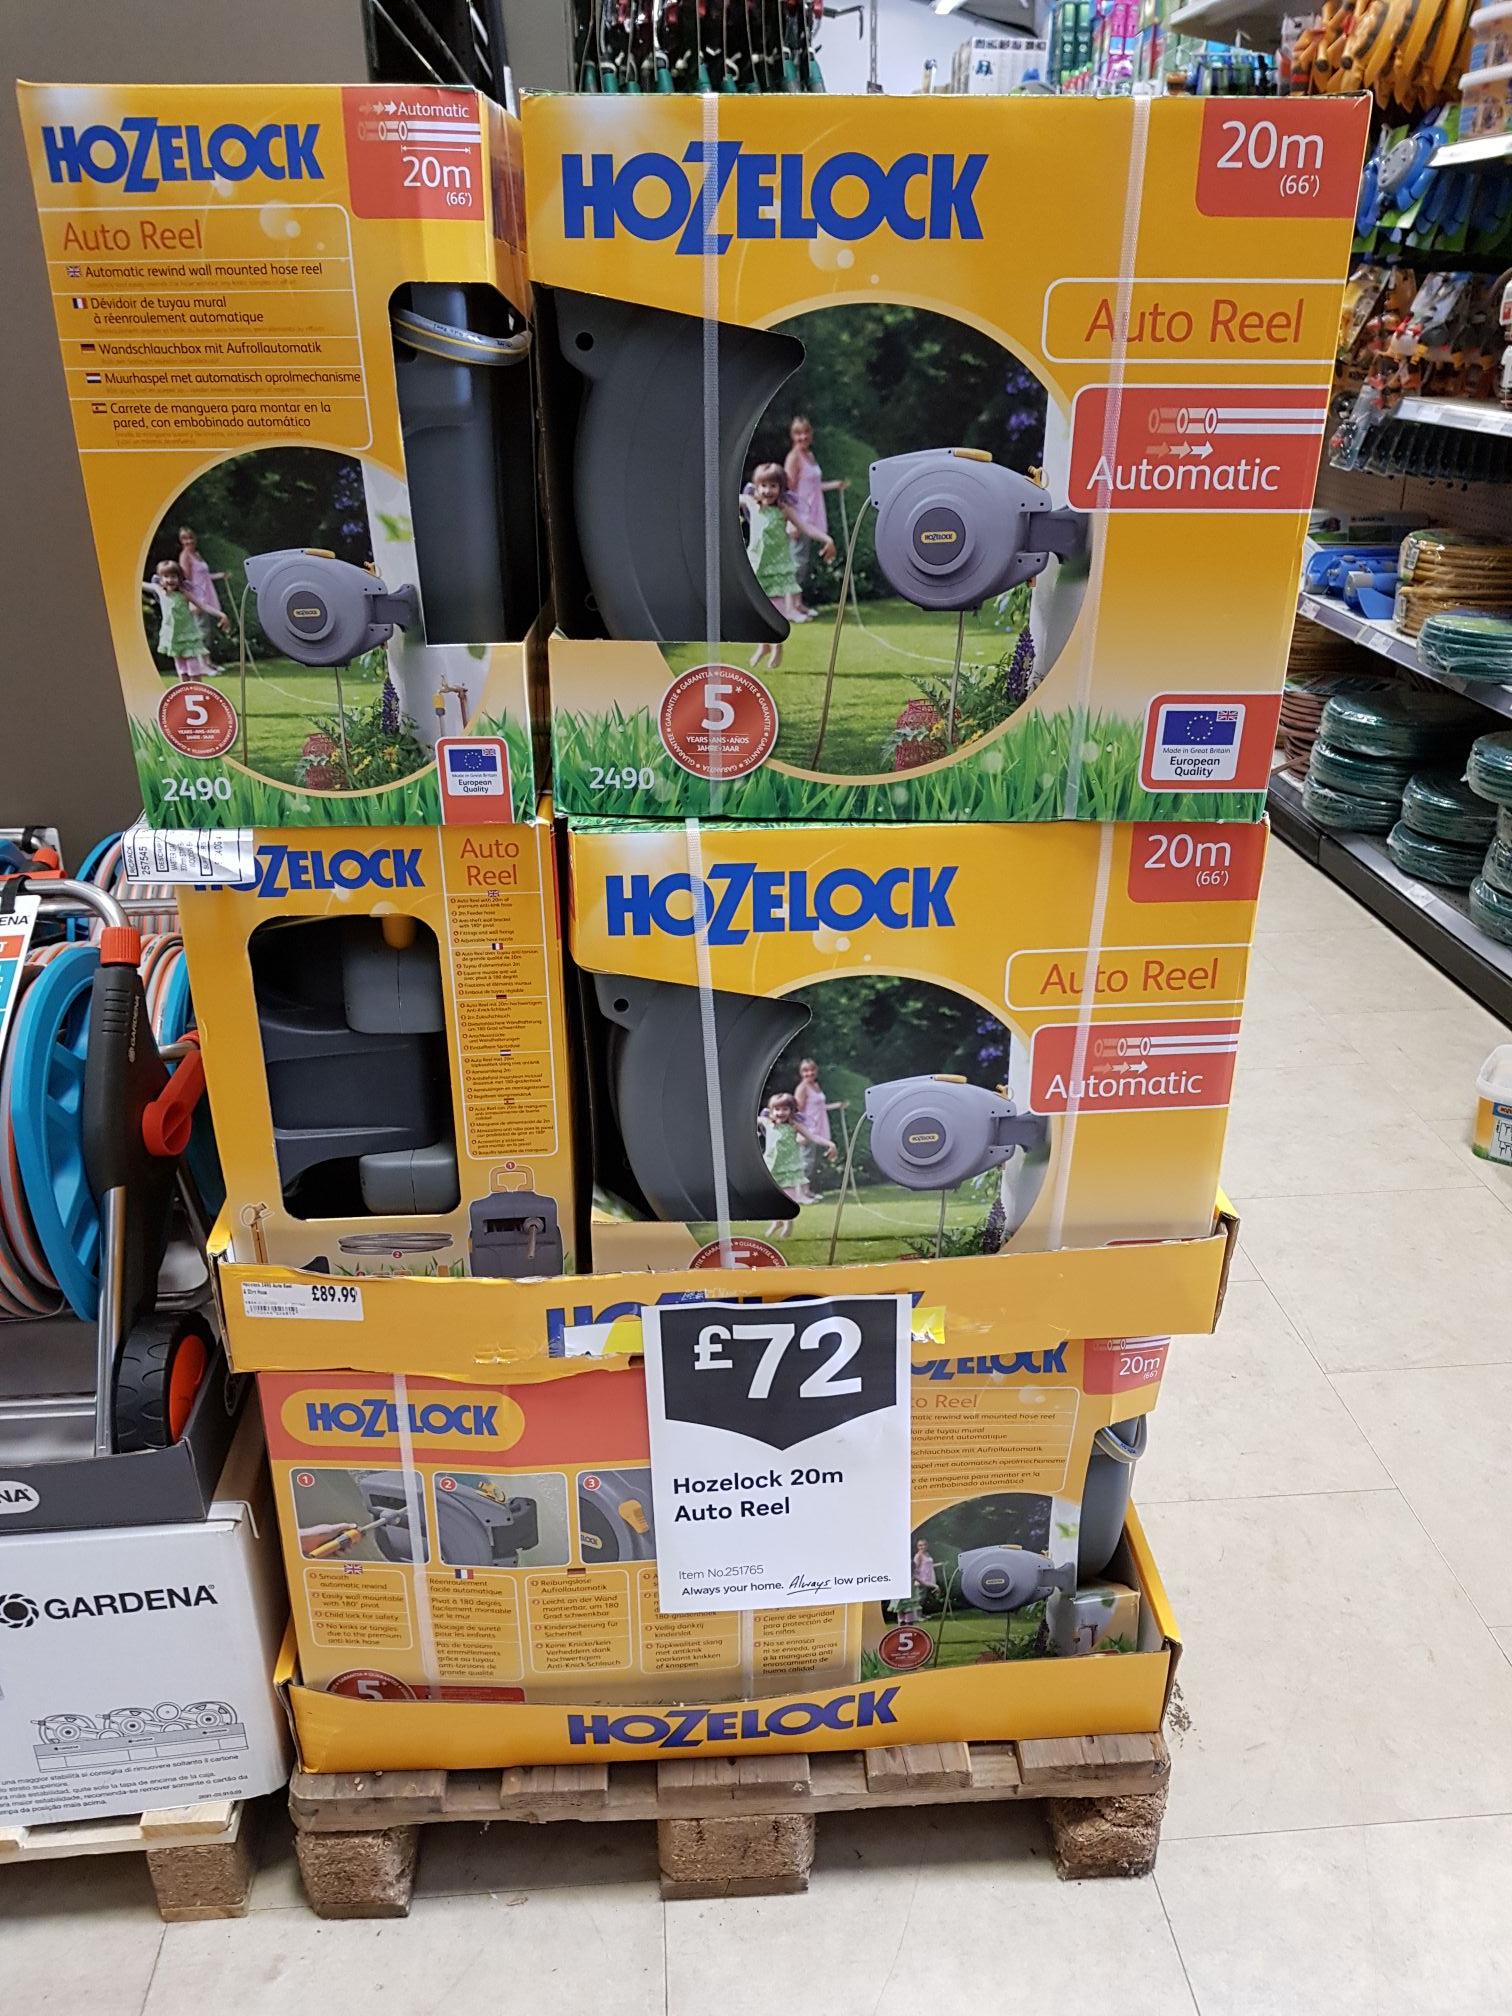 Hozelock Auto Reel £72 @ Homebase instore